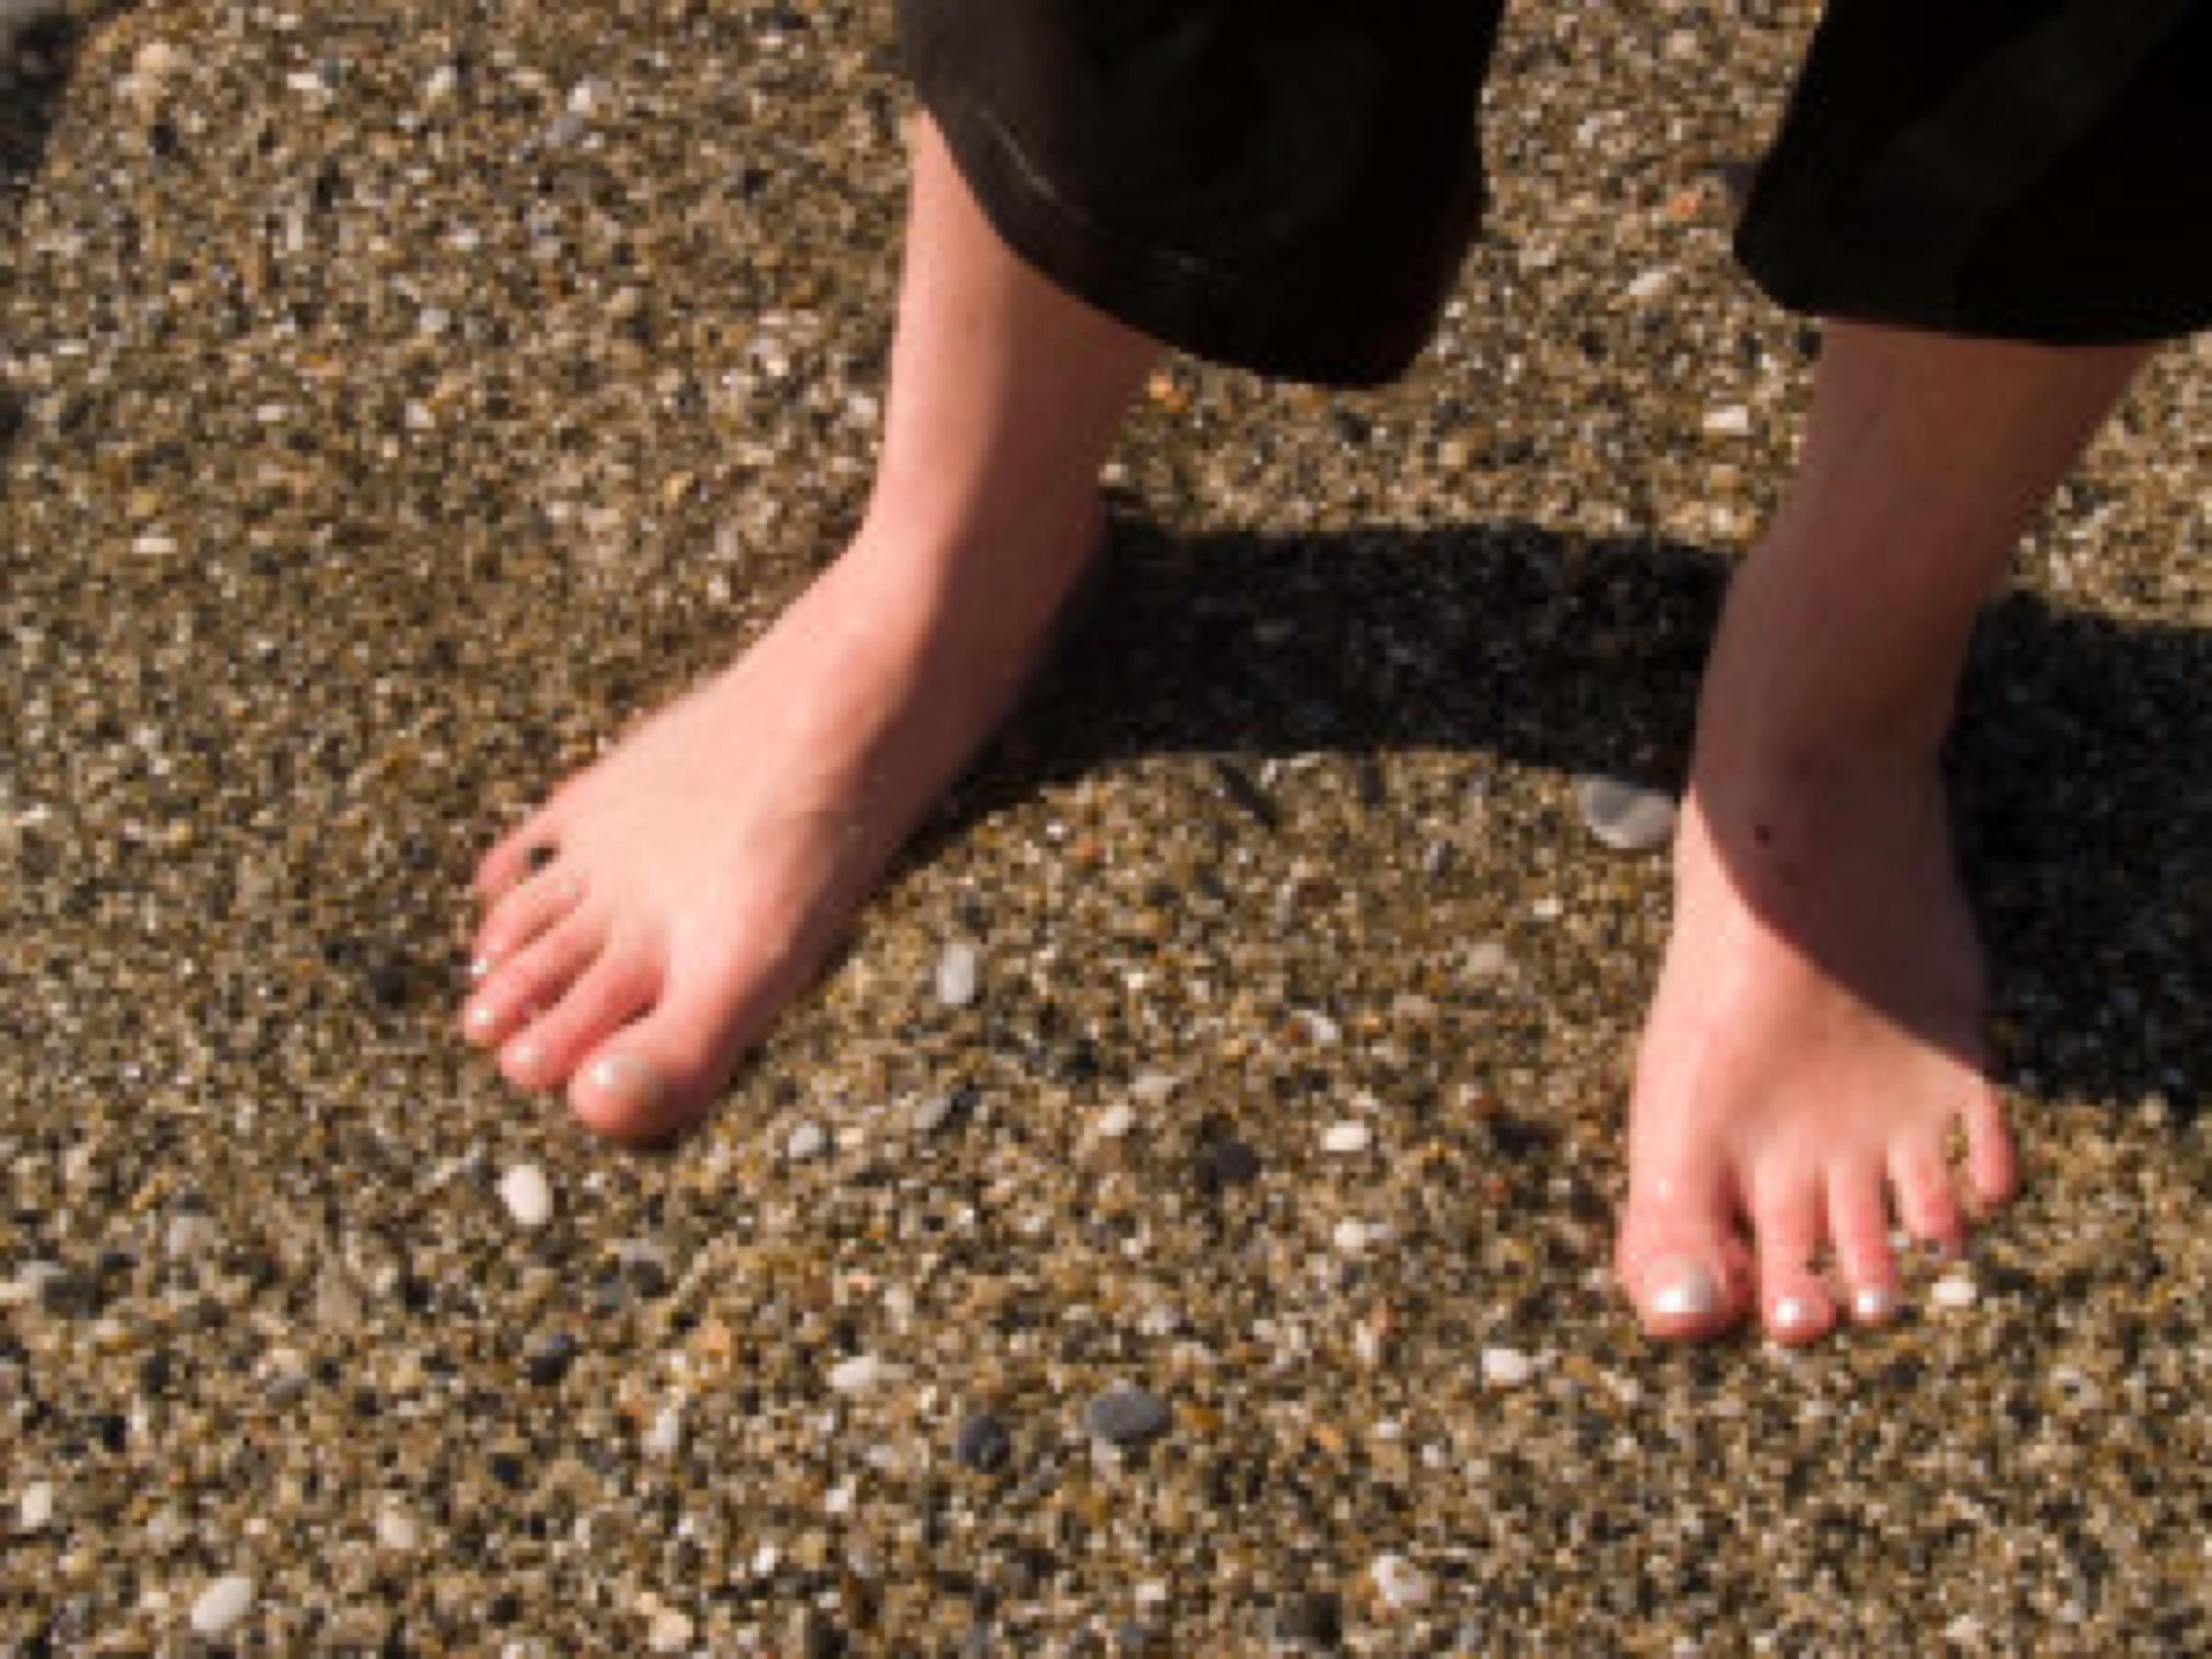 blog image - feet